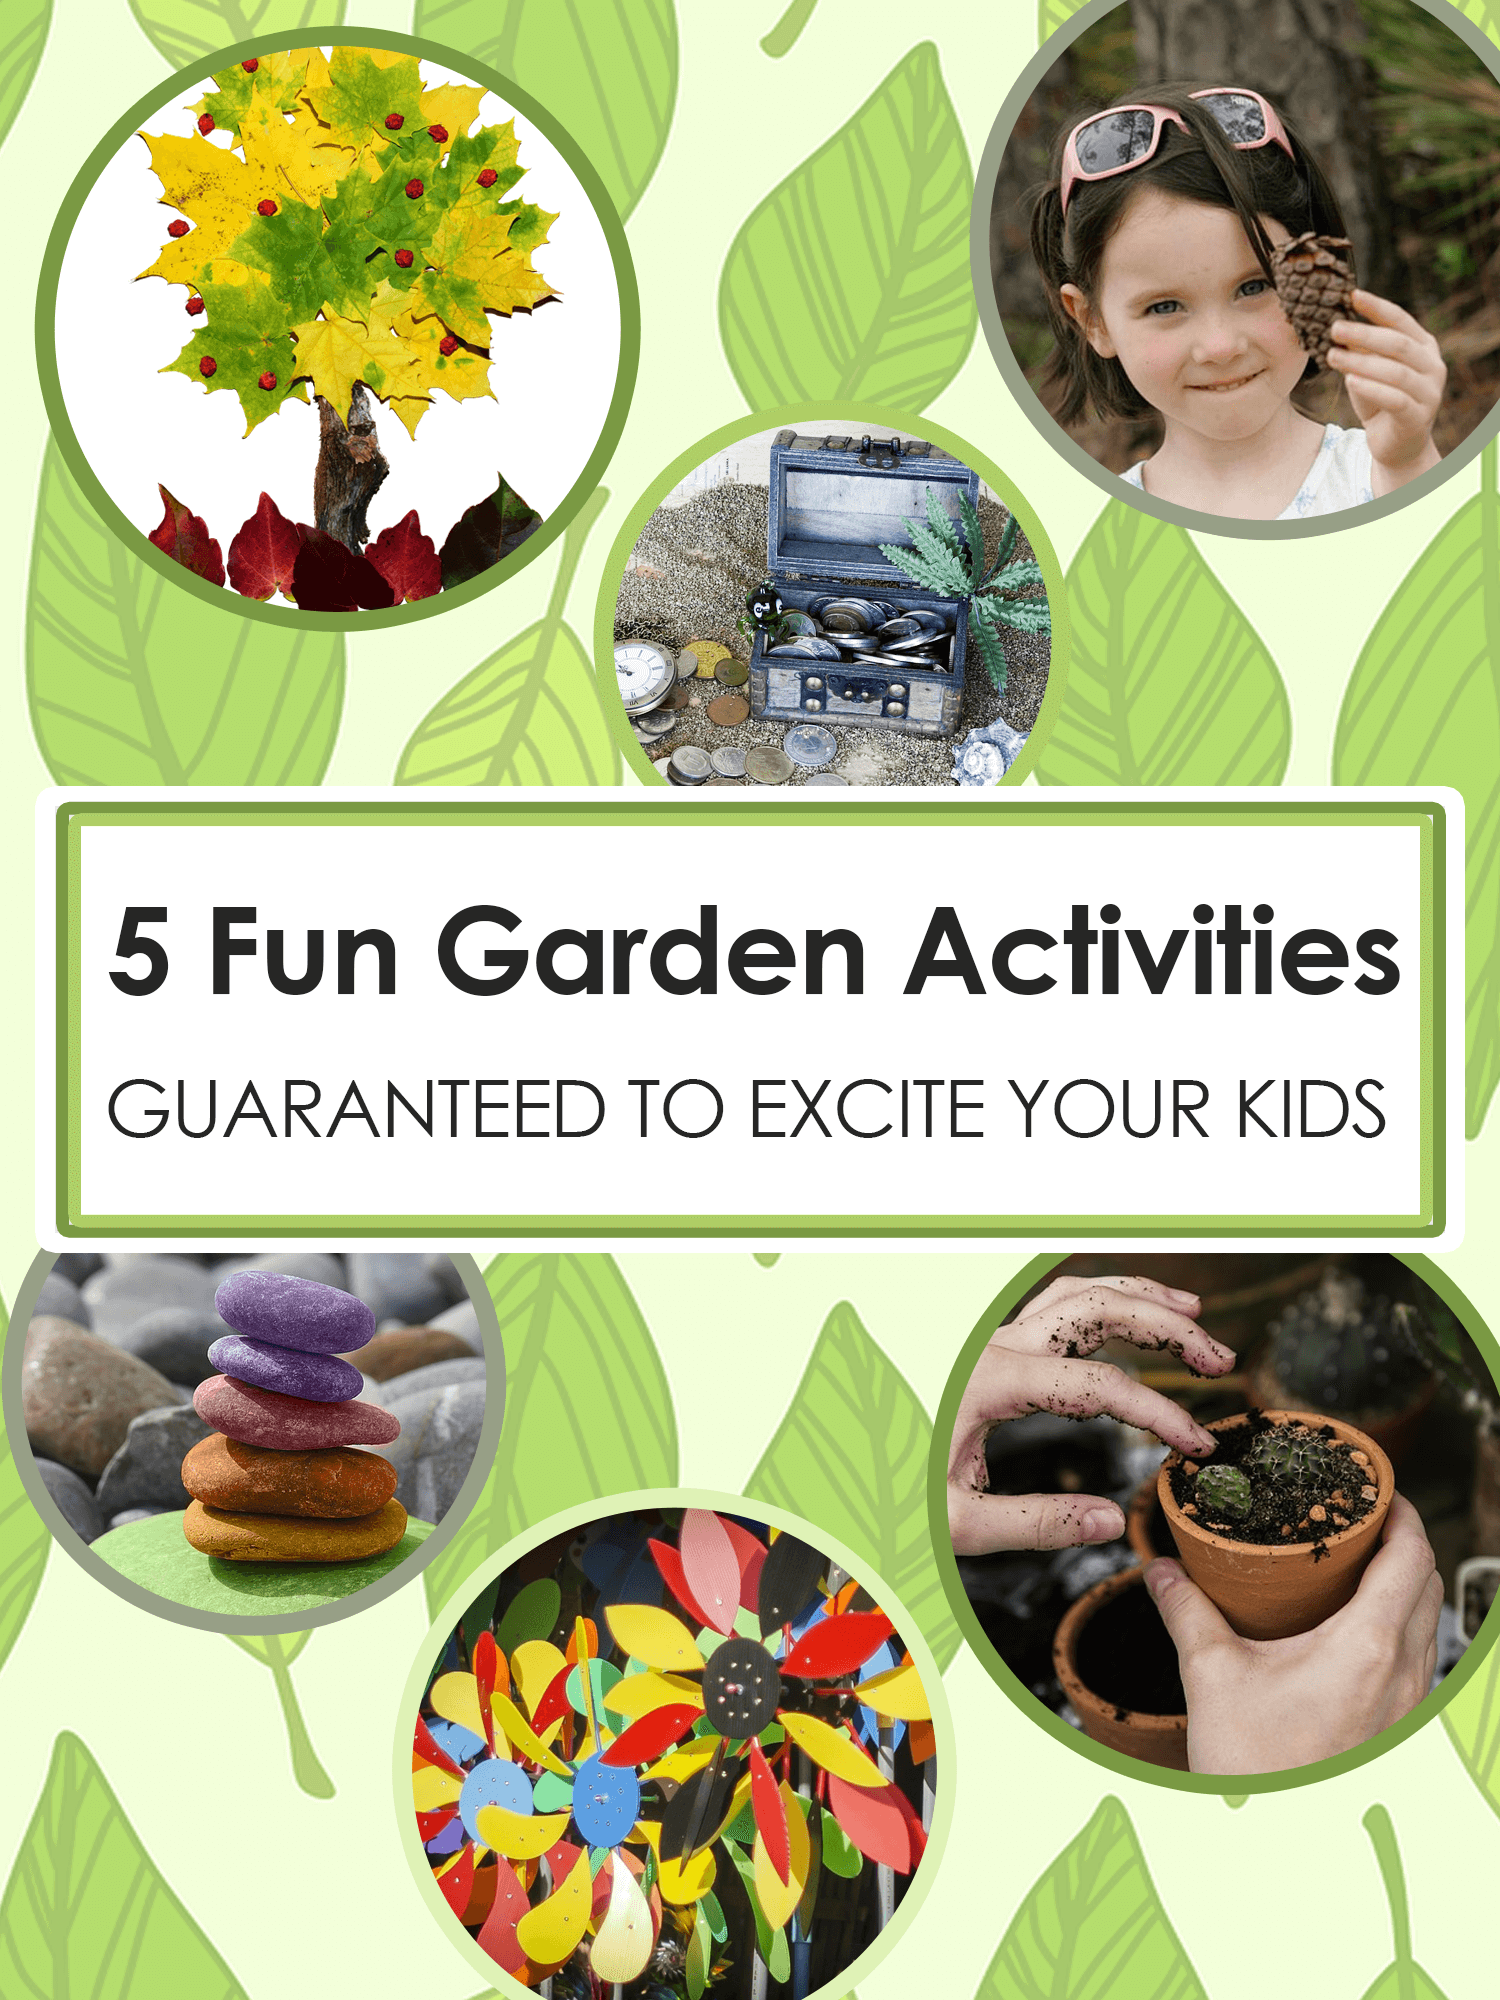 5 Fun Garden Activities Guaranteed To Excite Your Kids Imagine Forest